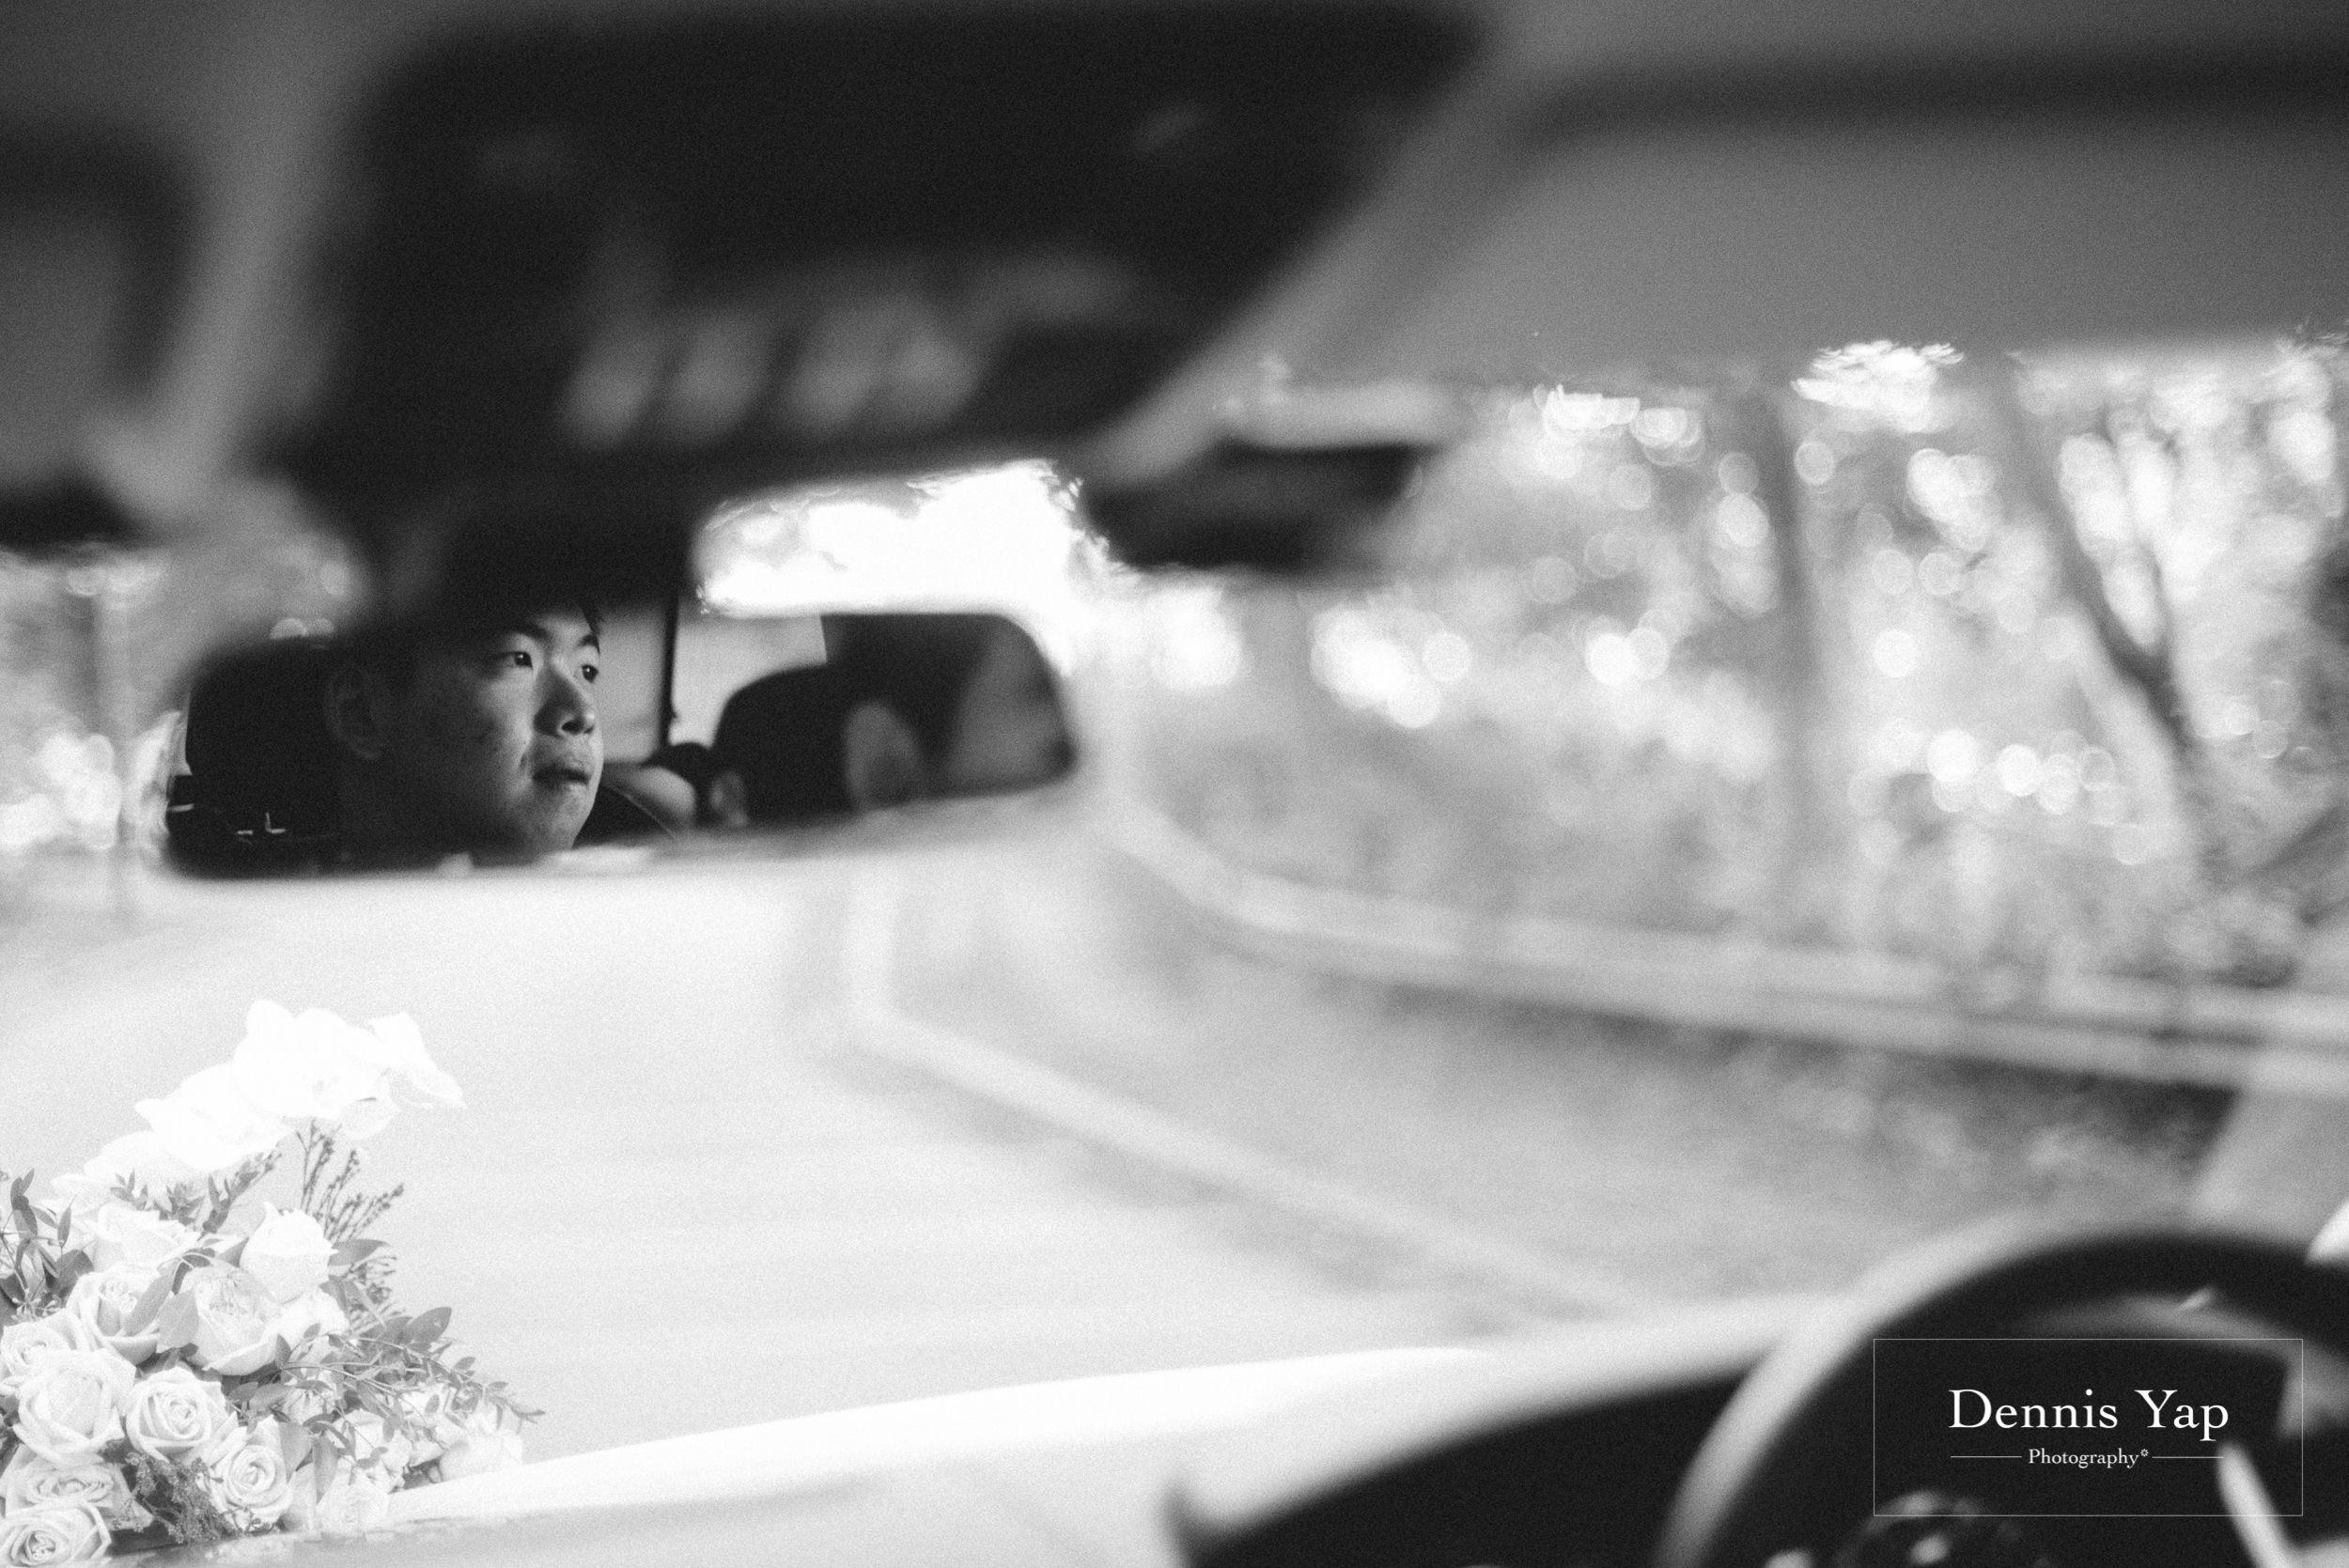 kuan rachel wedding day kuala lumpur melbourne gate crash dennis yap malaysia wedding photographer-4.jpg